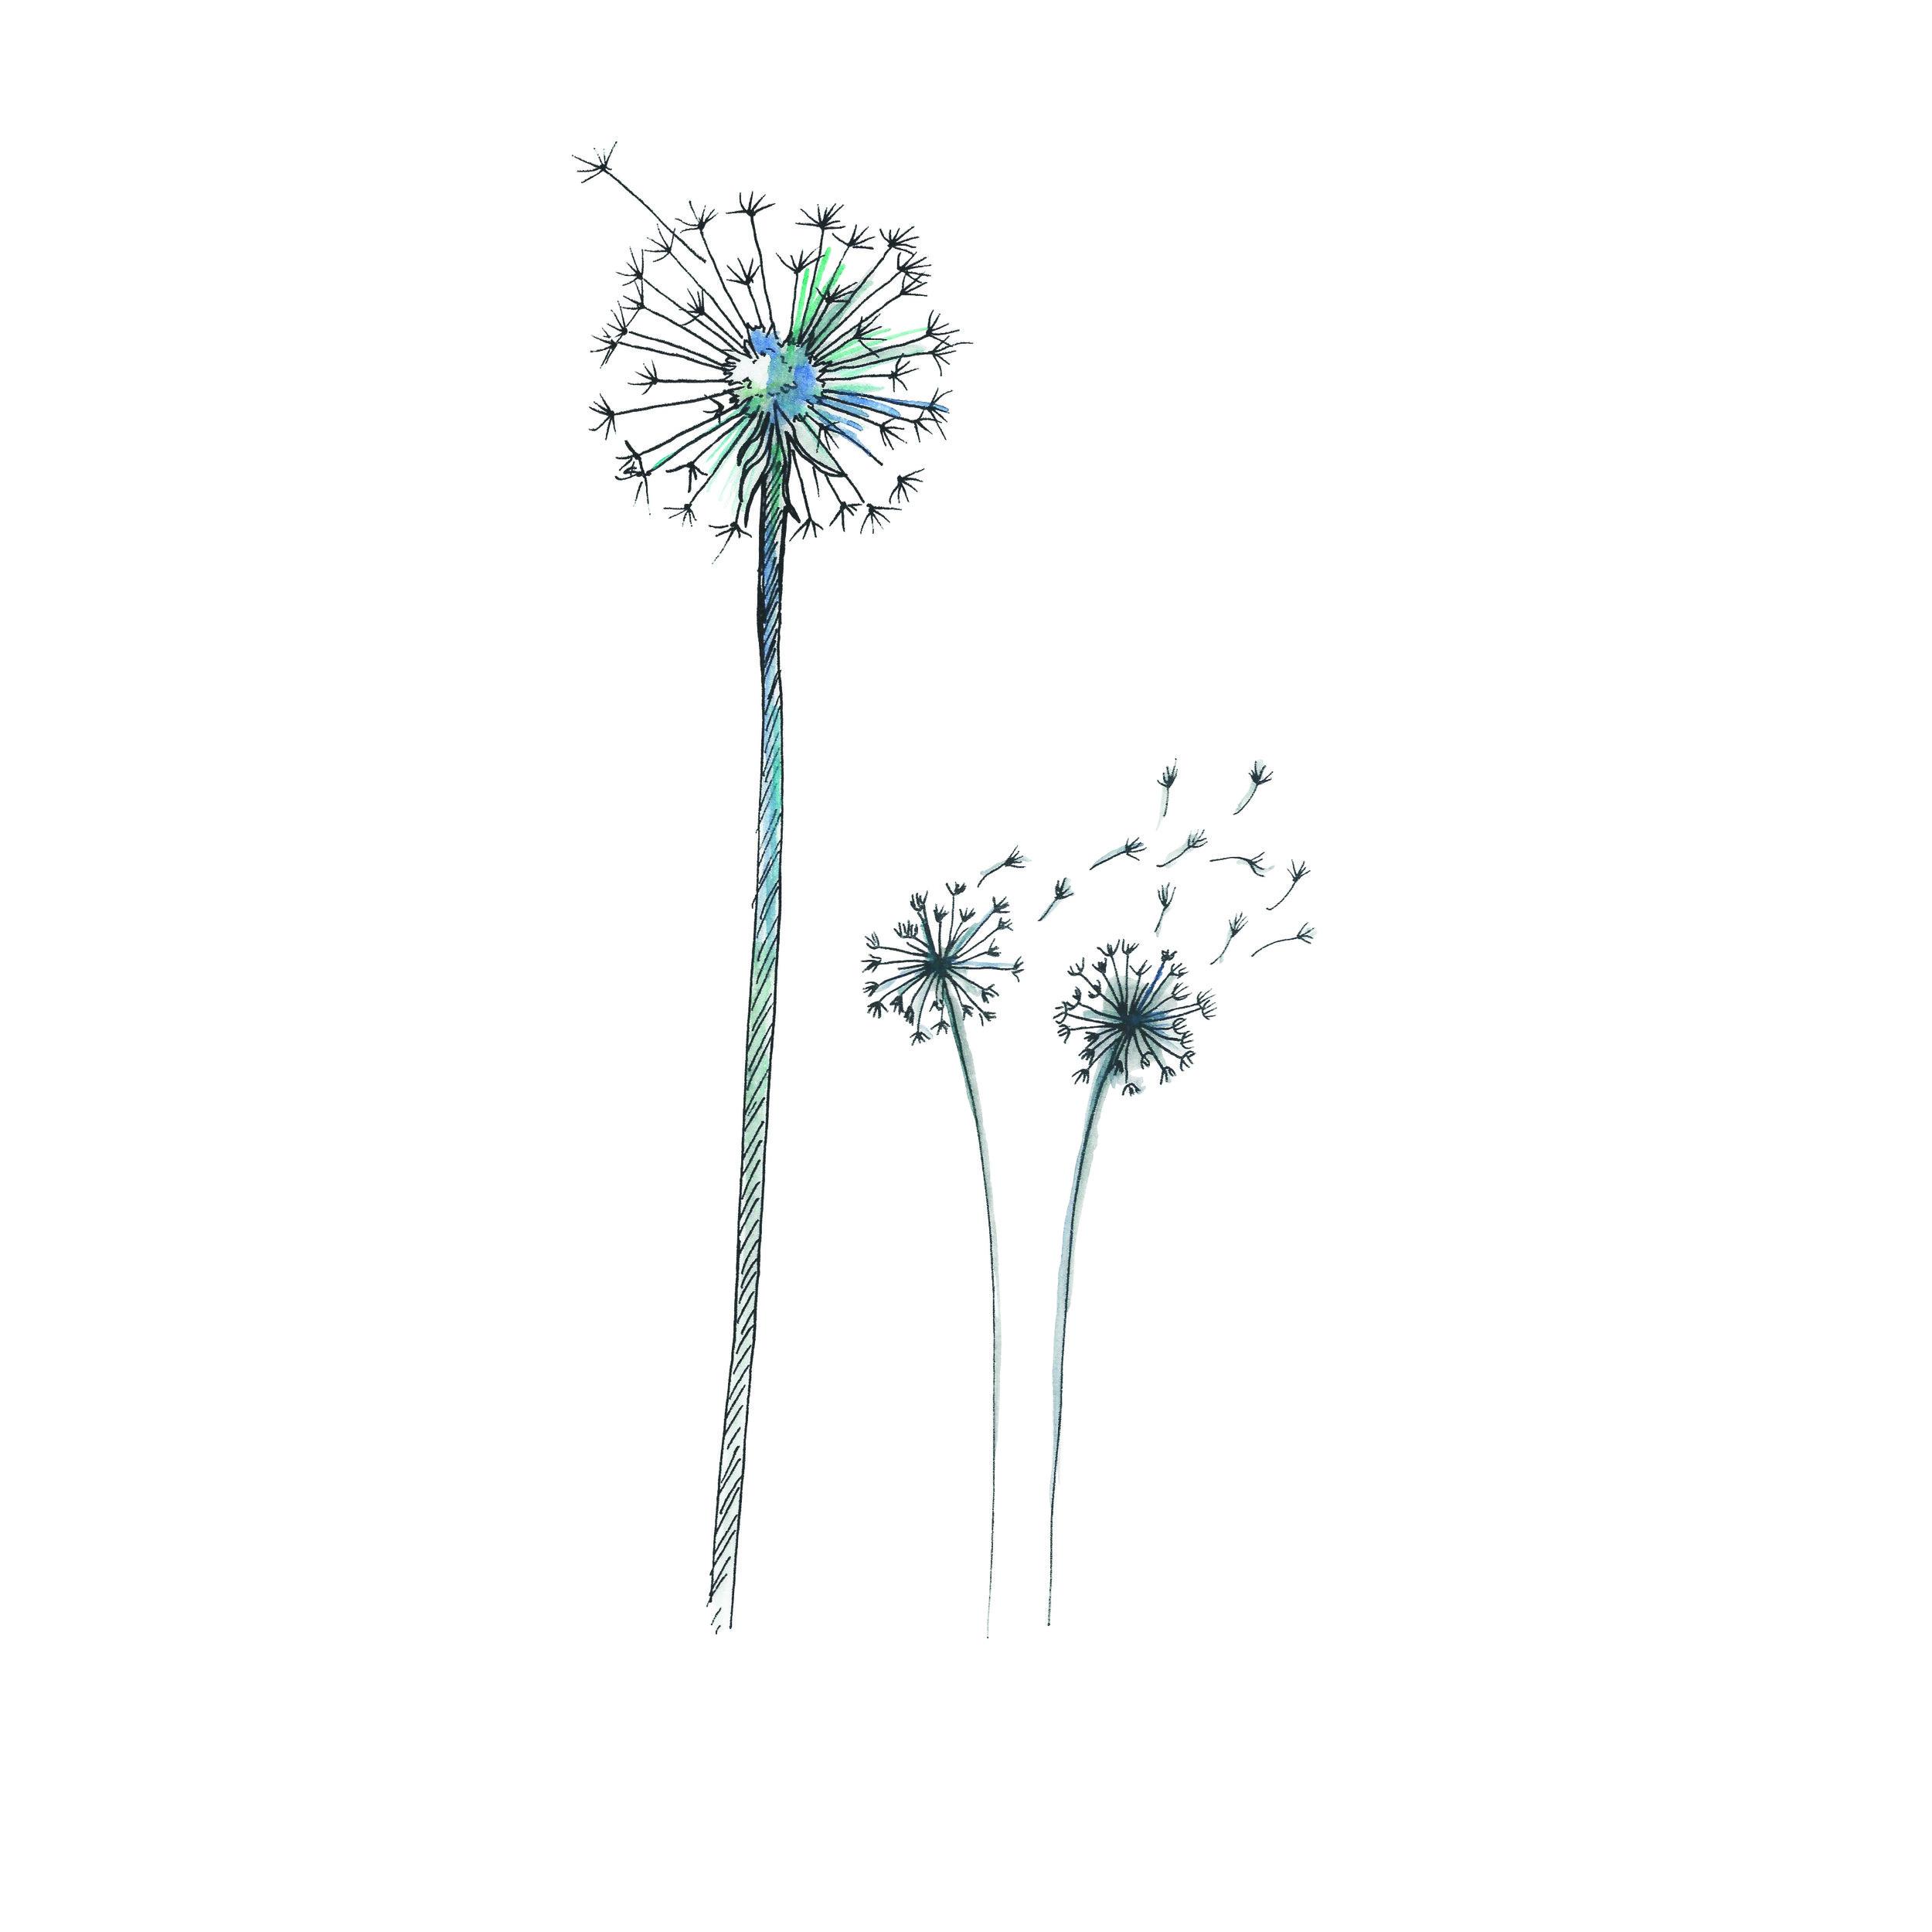 Wish Flowers (Dandelions)